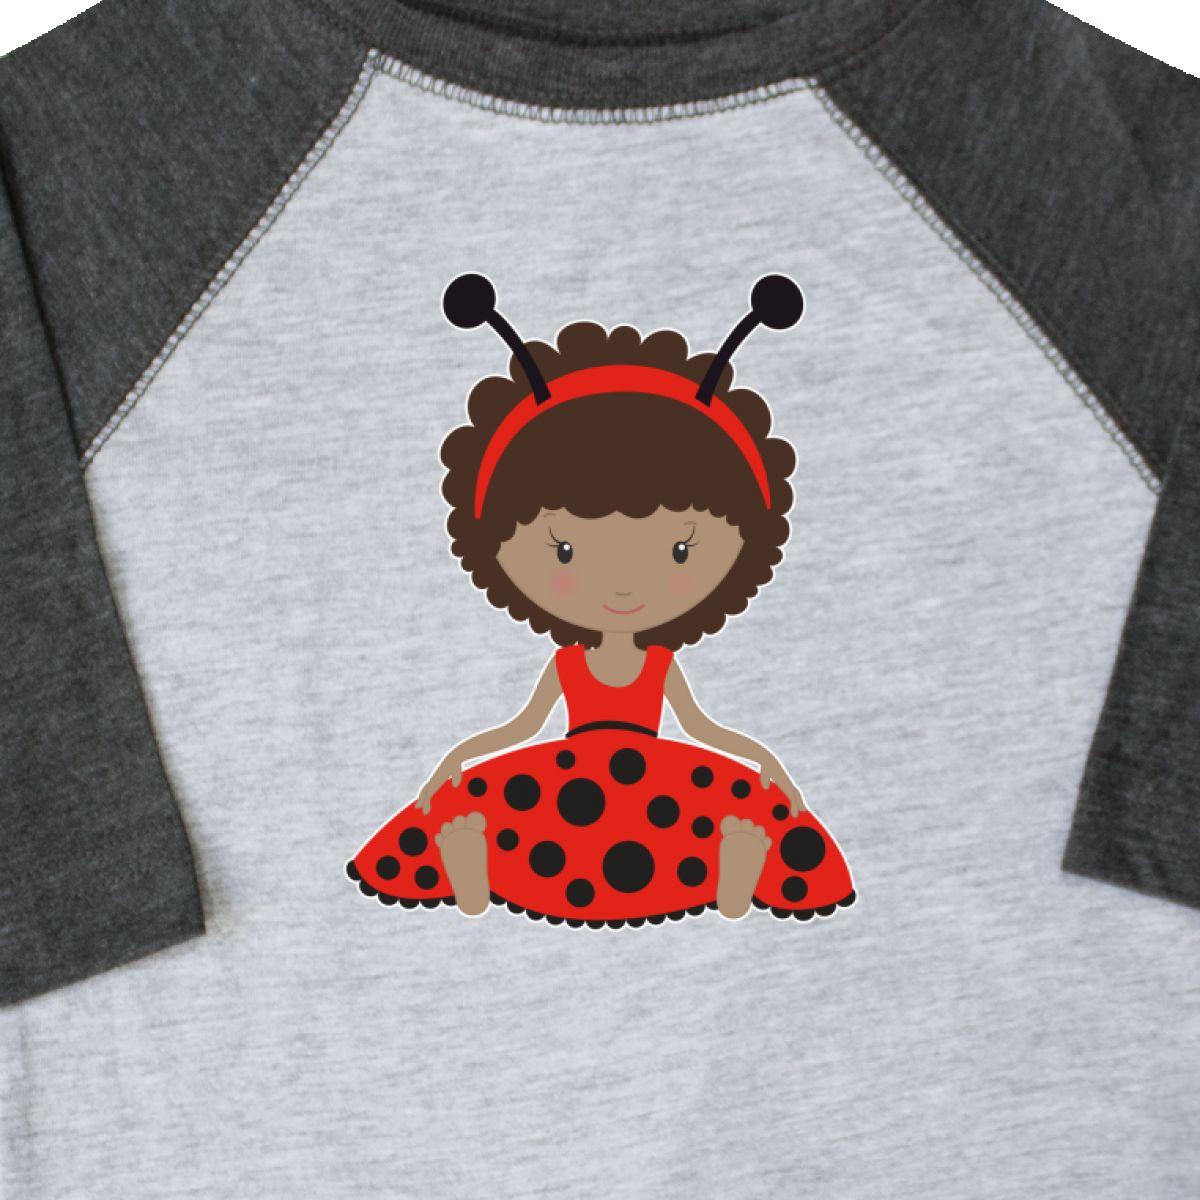 Inktastic Ethnic Ladybug Girl In Red Dress Toddler T-Shirt Antennas Gift Child